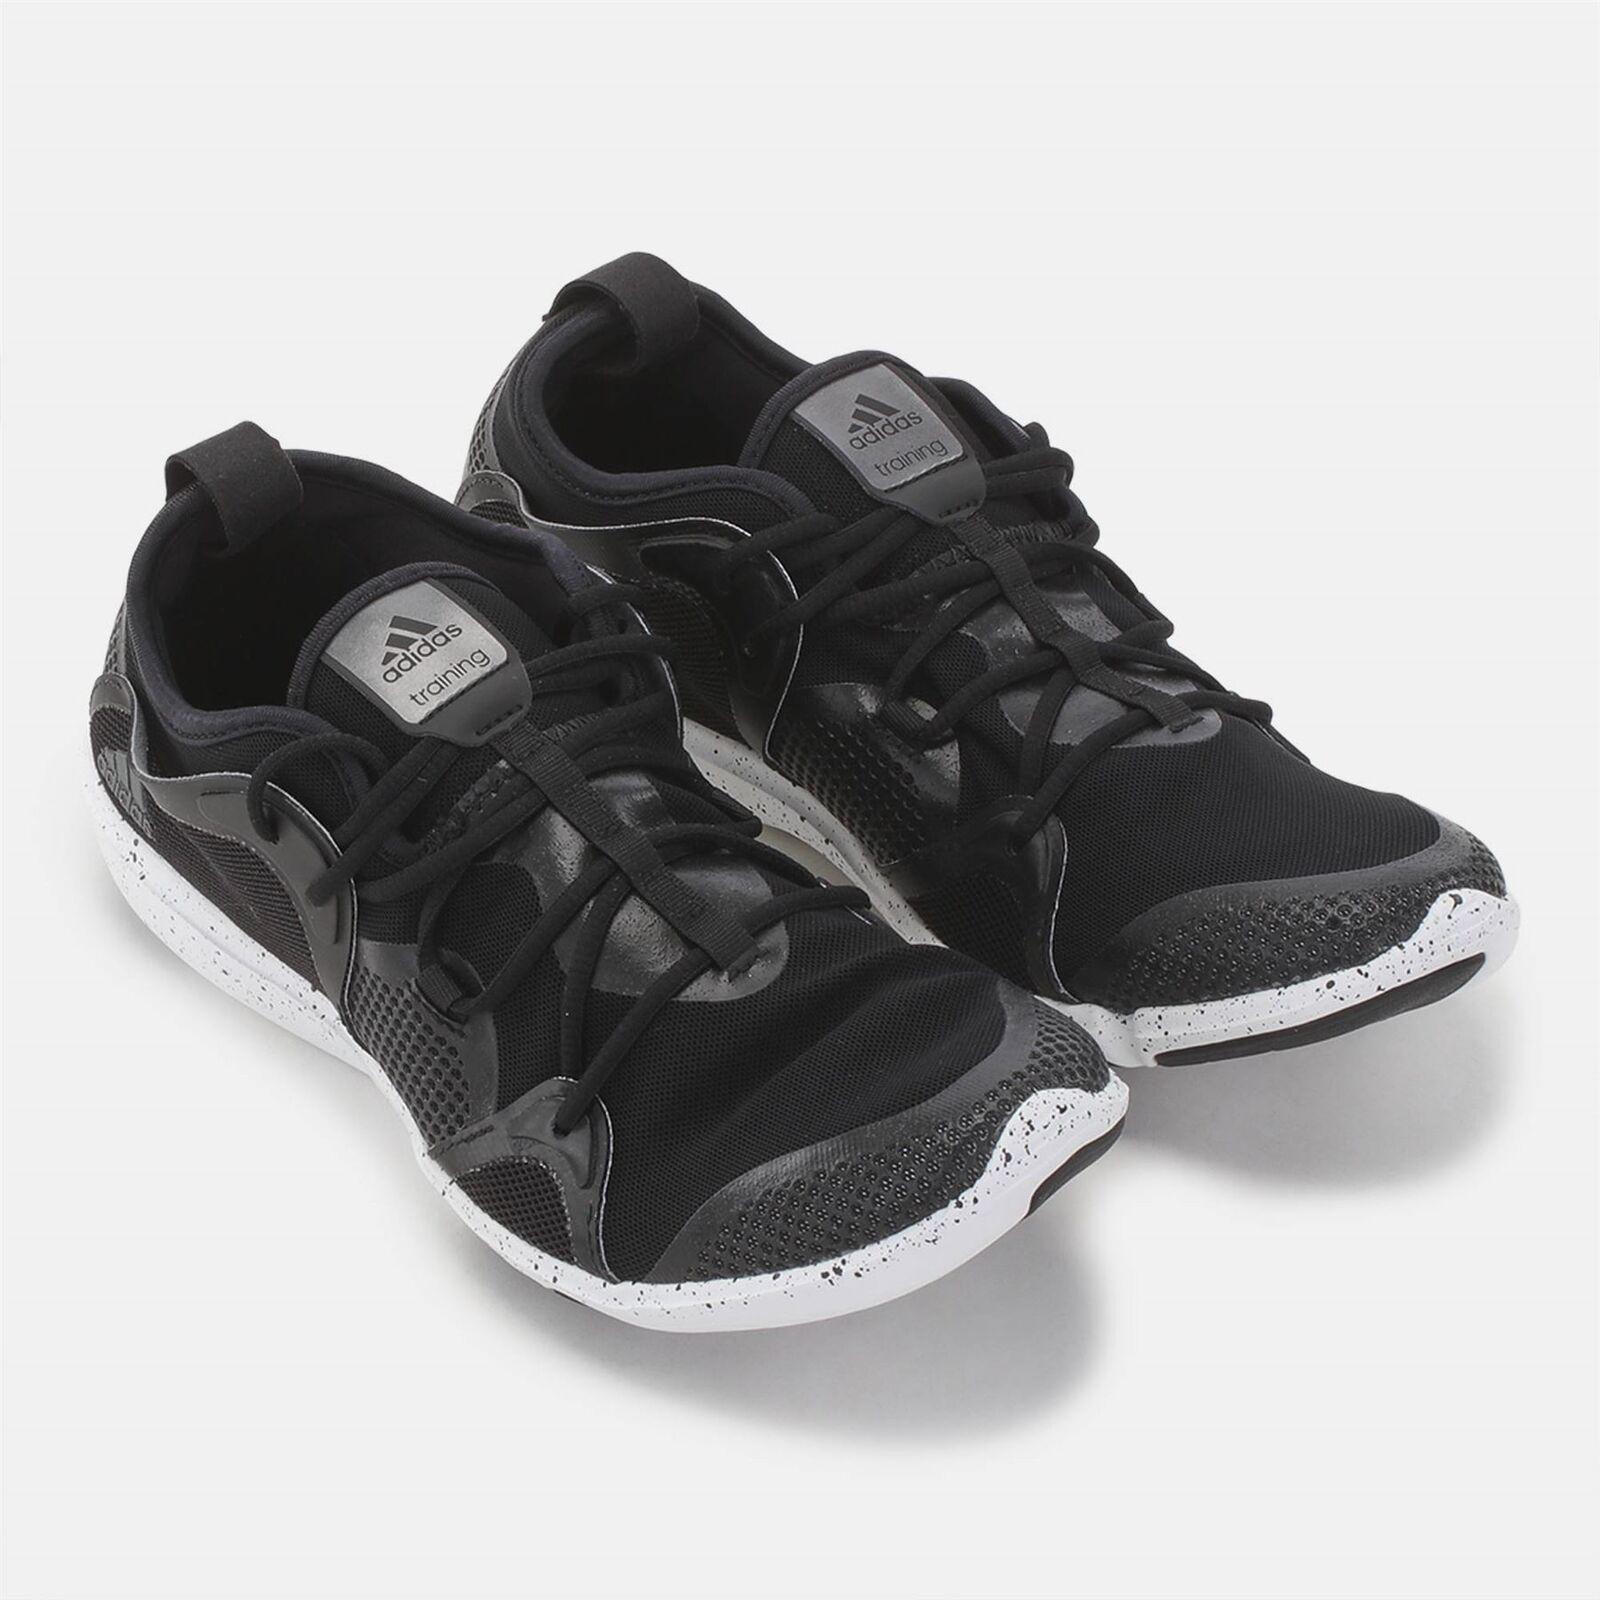 Adidas Adipure 360.4 Trainers donna nero Training scarpe Gym Fitness scarpe da ginnastica